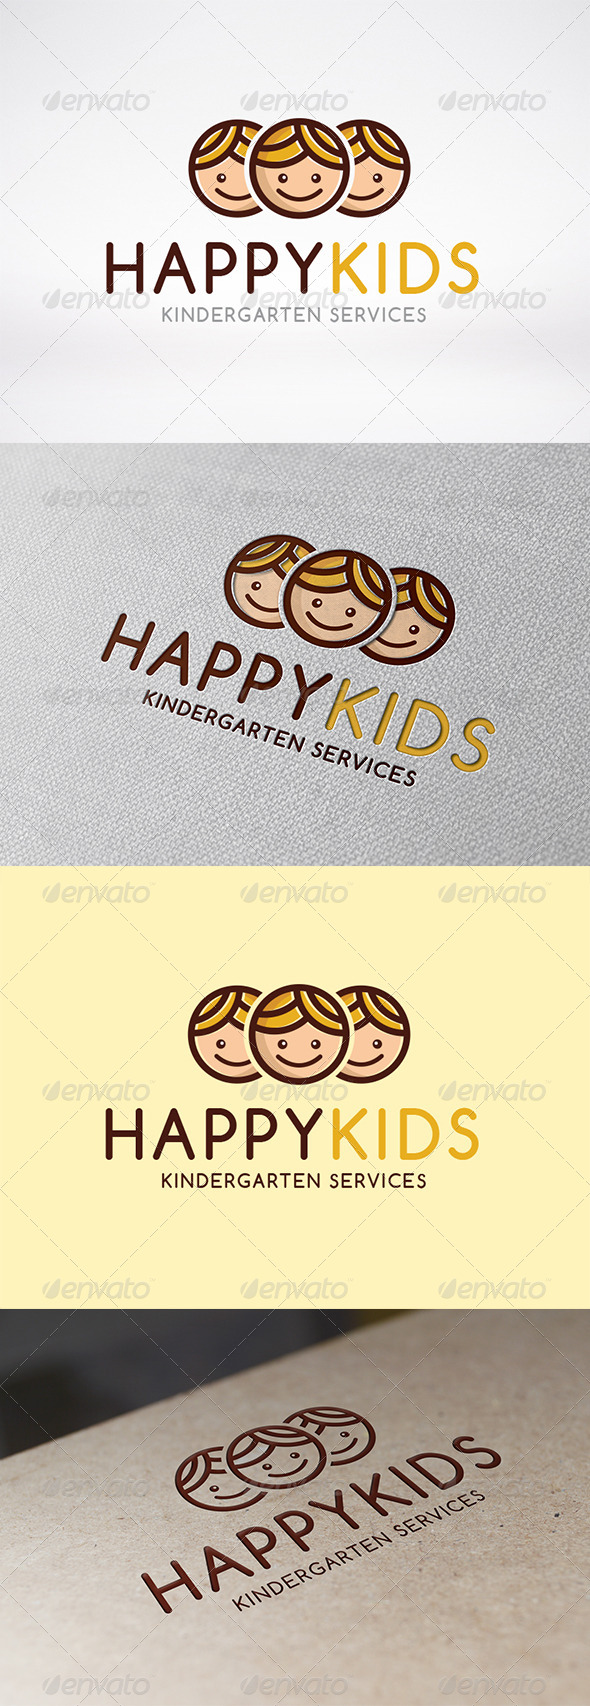 GraphicRiver Happy Kids Logo Template 6234764